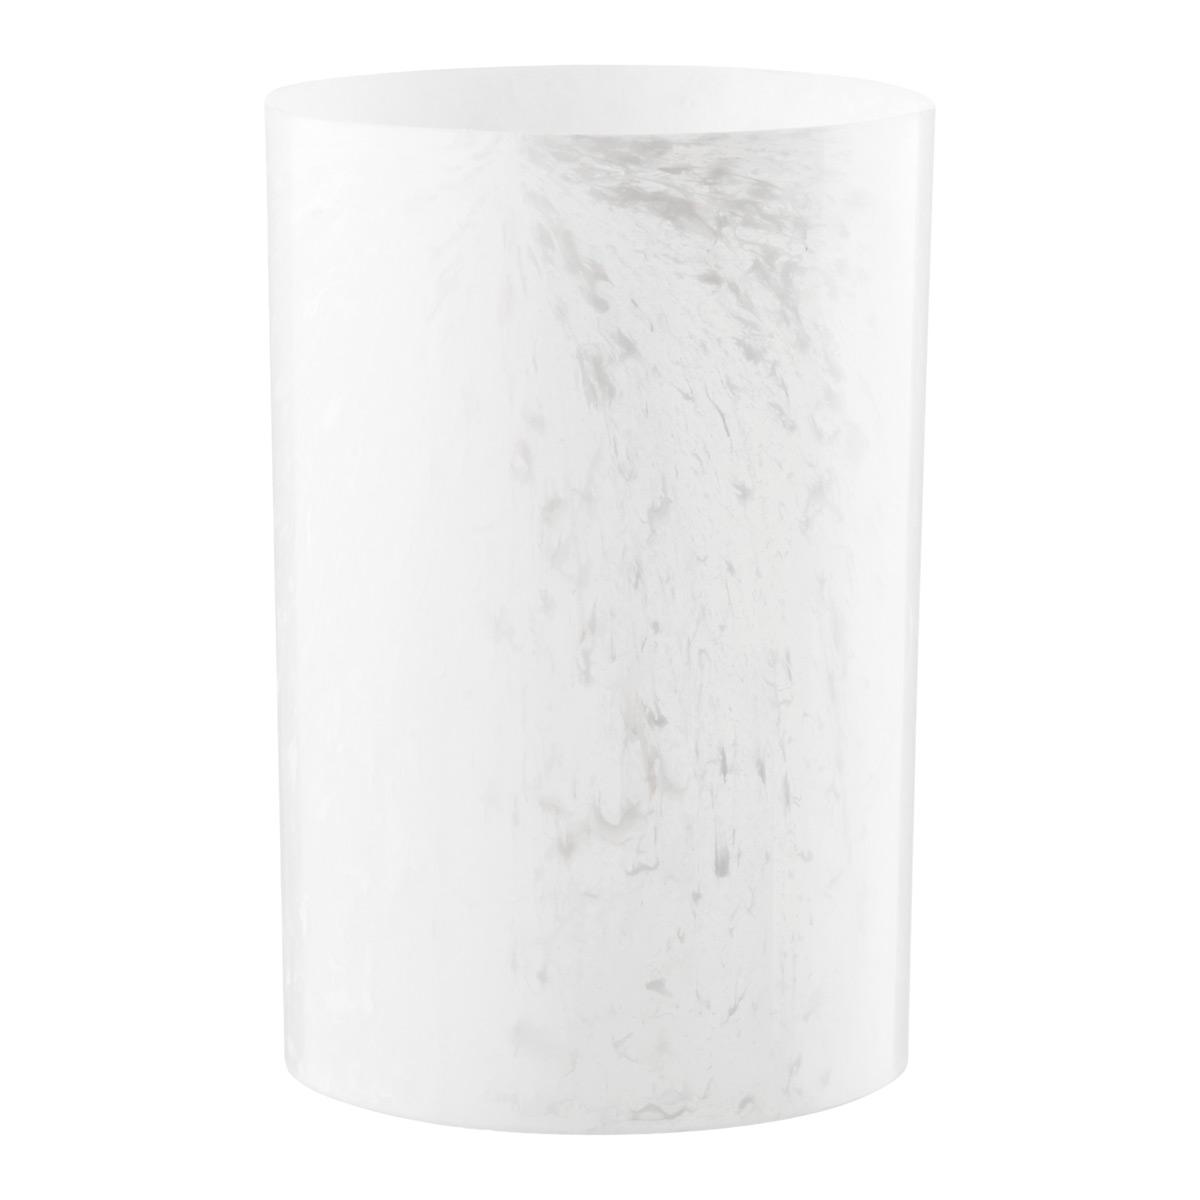 Umbra White Onyx Colonnade Wastebasket